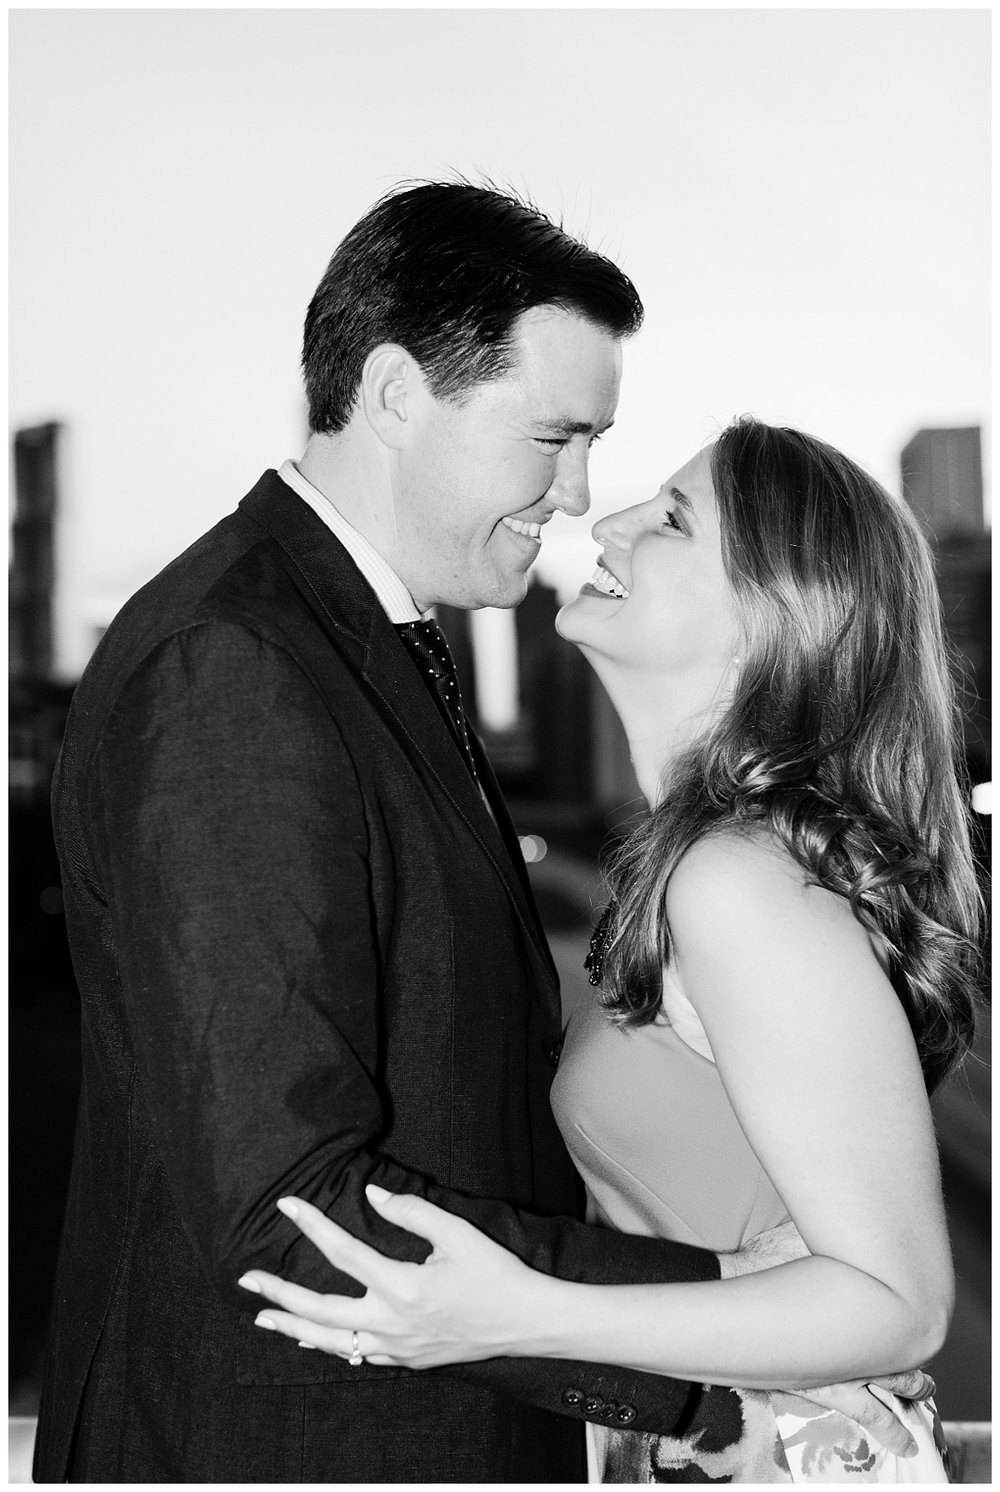 Engagement Pictures_KIm and Hamish_Abby Breaux Photography_Atlanta_Ponce City Market_Jackson Street Bridge_0068.jpg